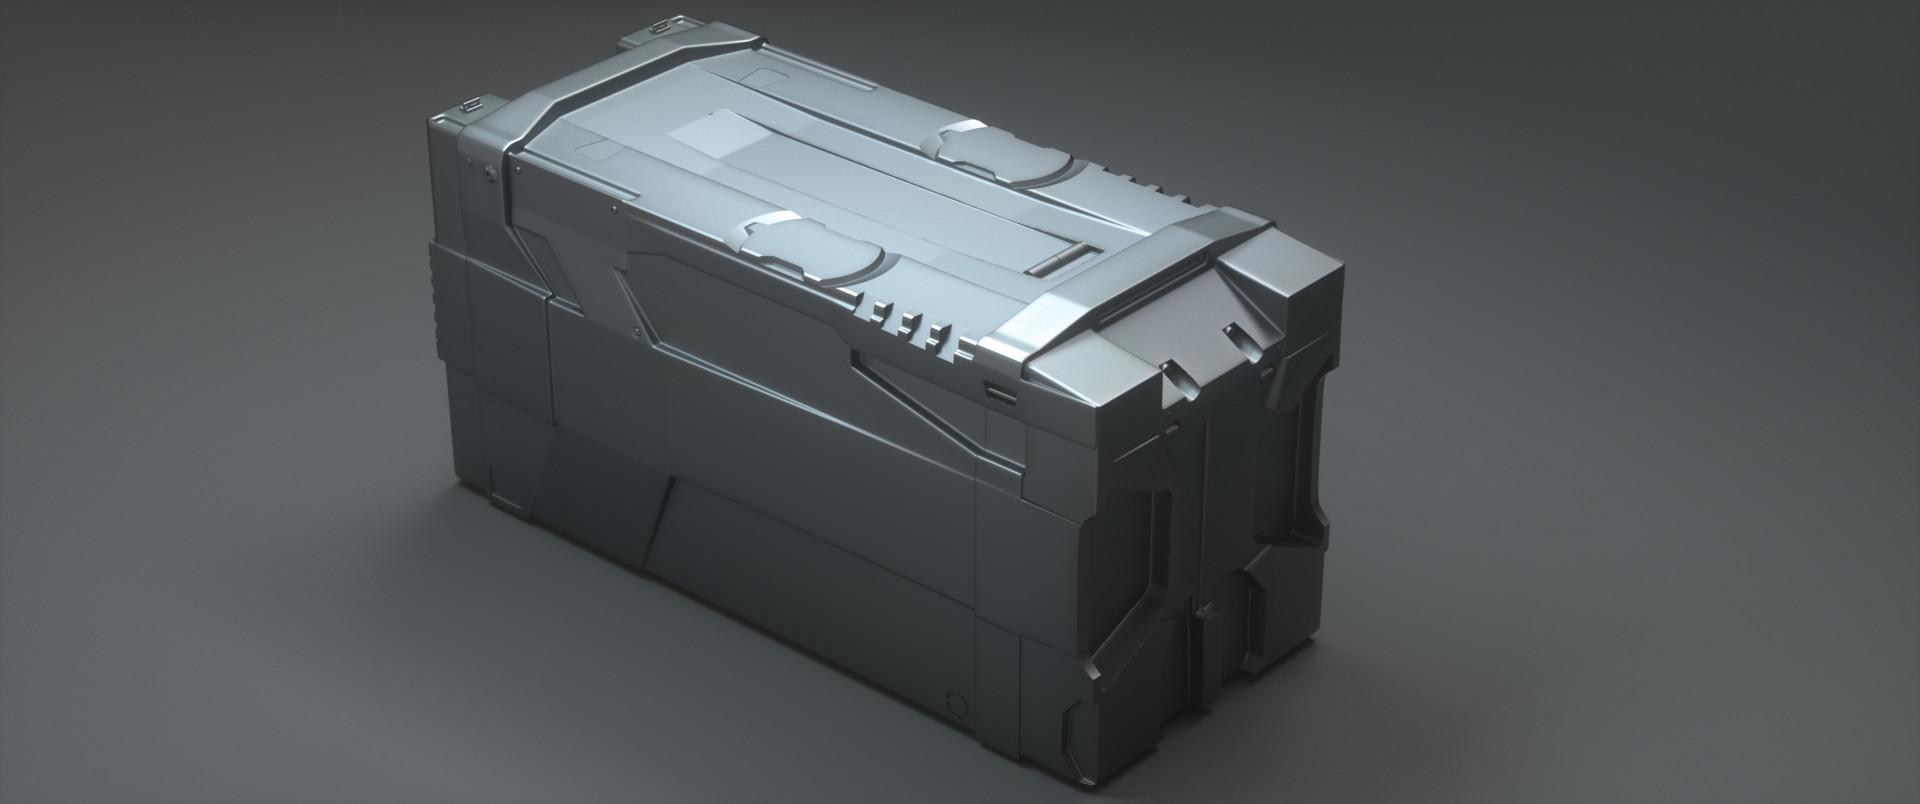 Kresimir jelusic robob3ar 493 breaking the box3